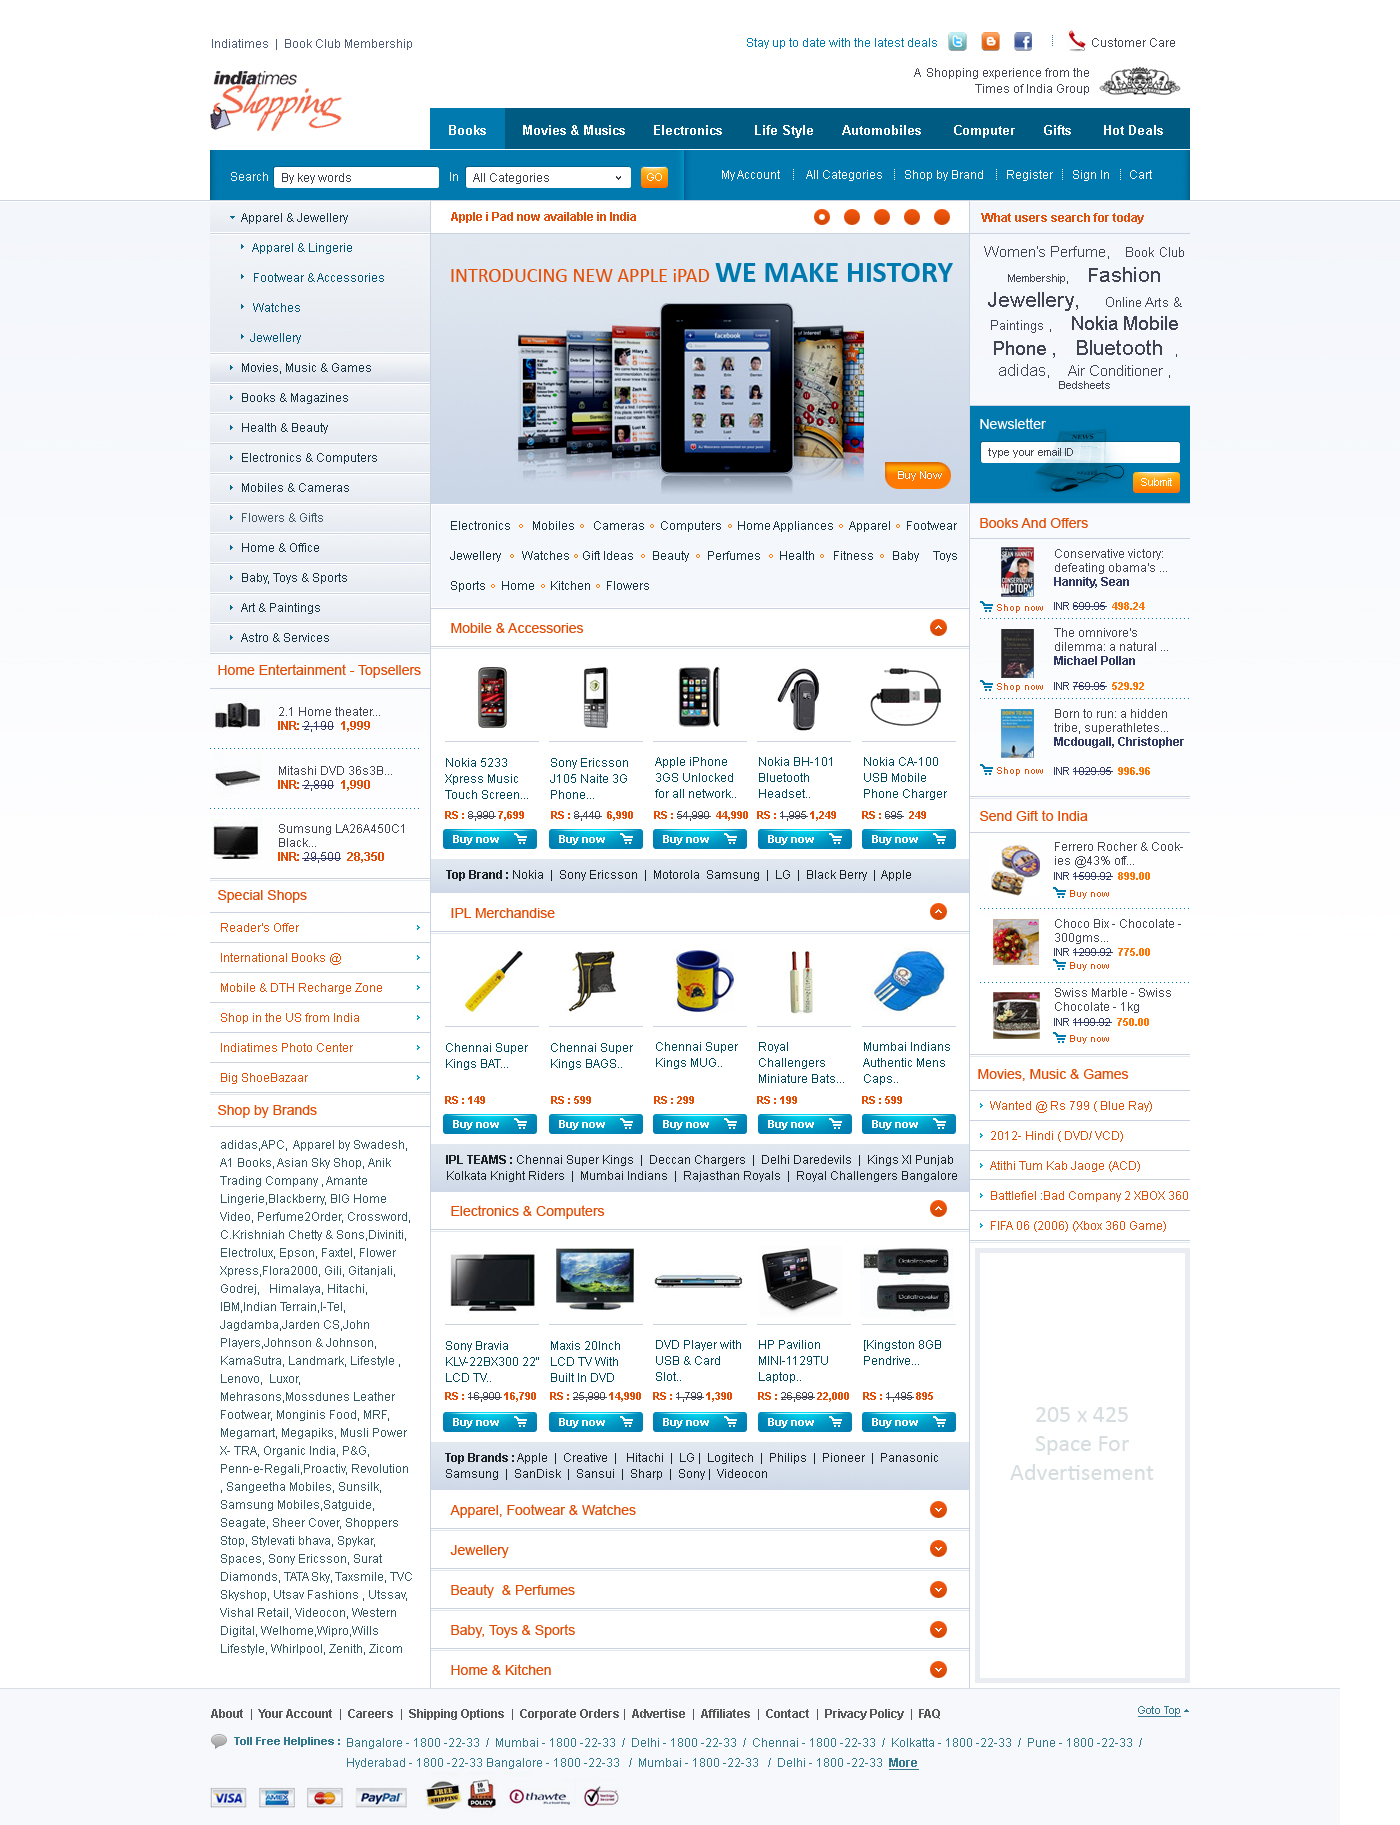 Indiatimes Shopping by riyaz7cp